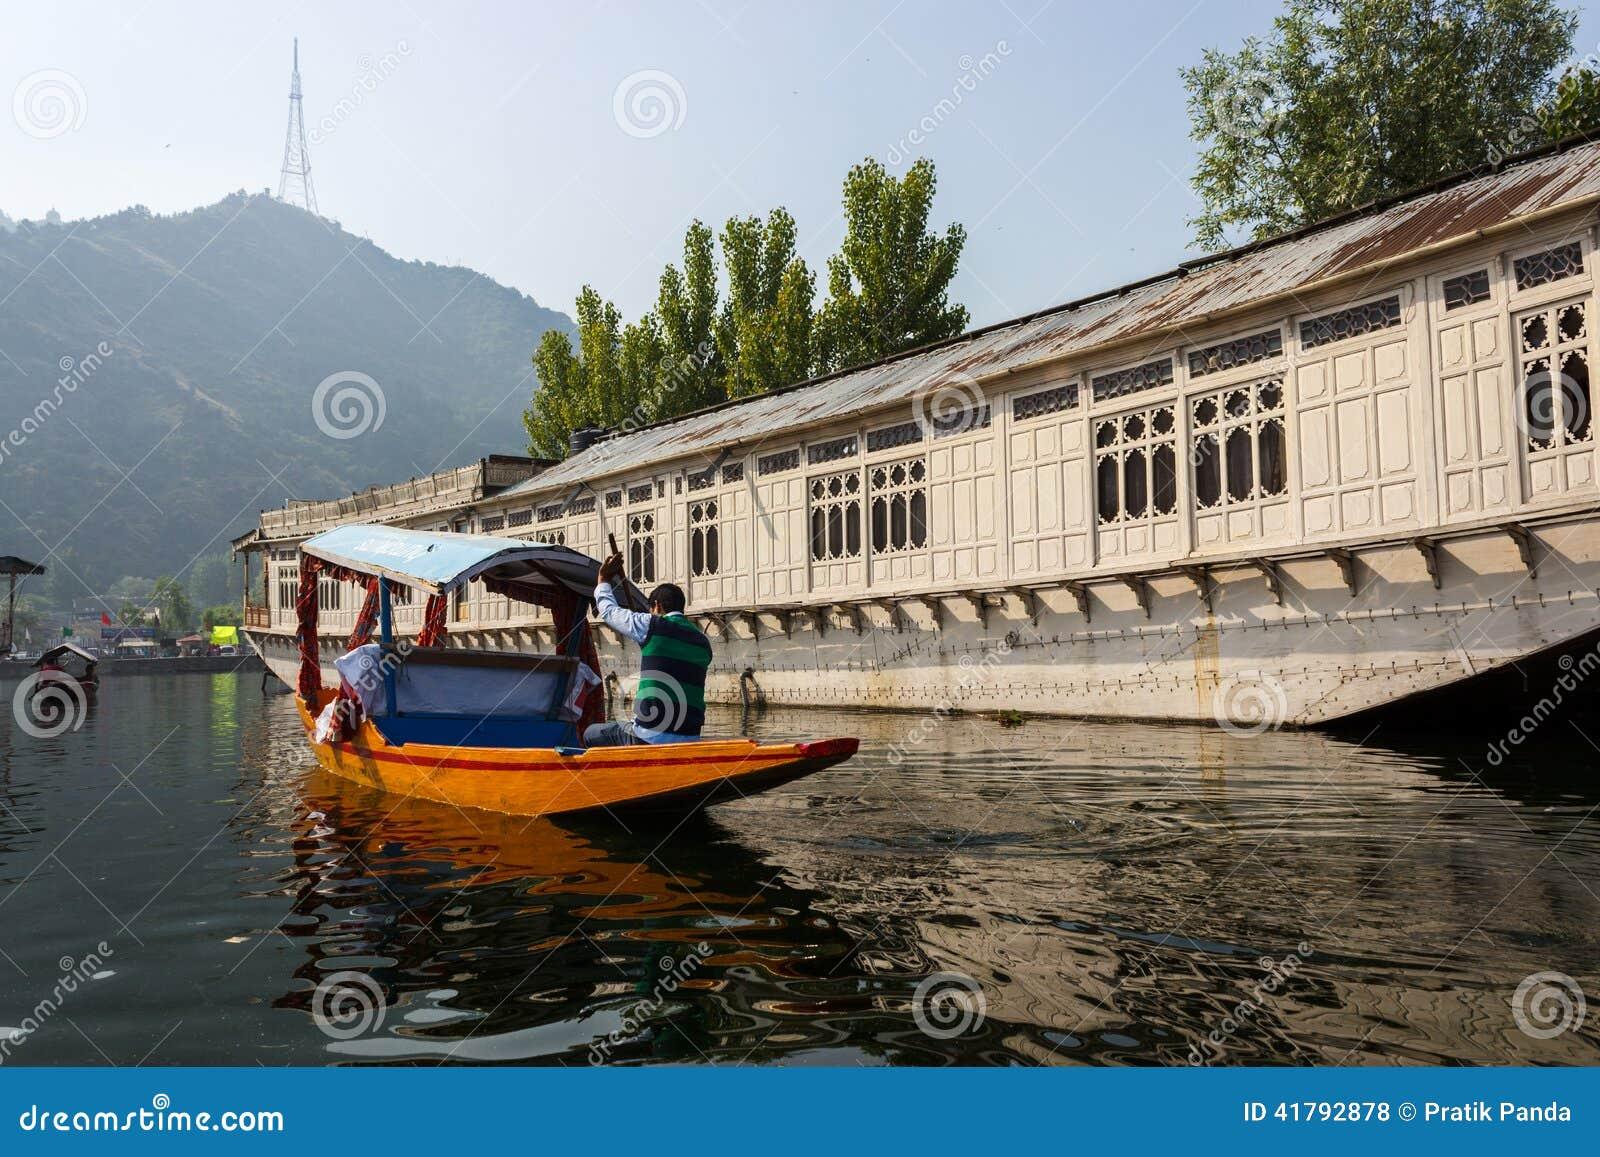 Dal Lake, Srinagar, Jammu And Kashmir Tourism Editorial Stock Photo - Image: 41792878